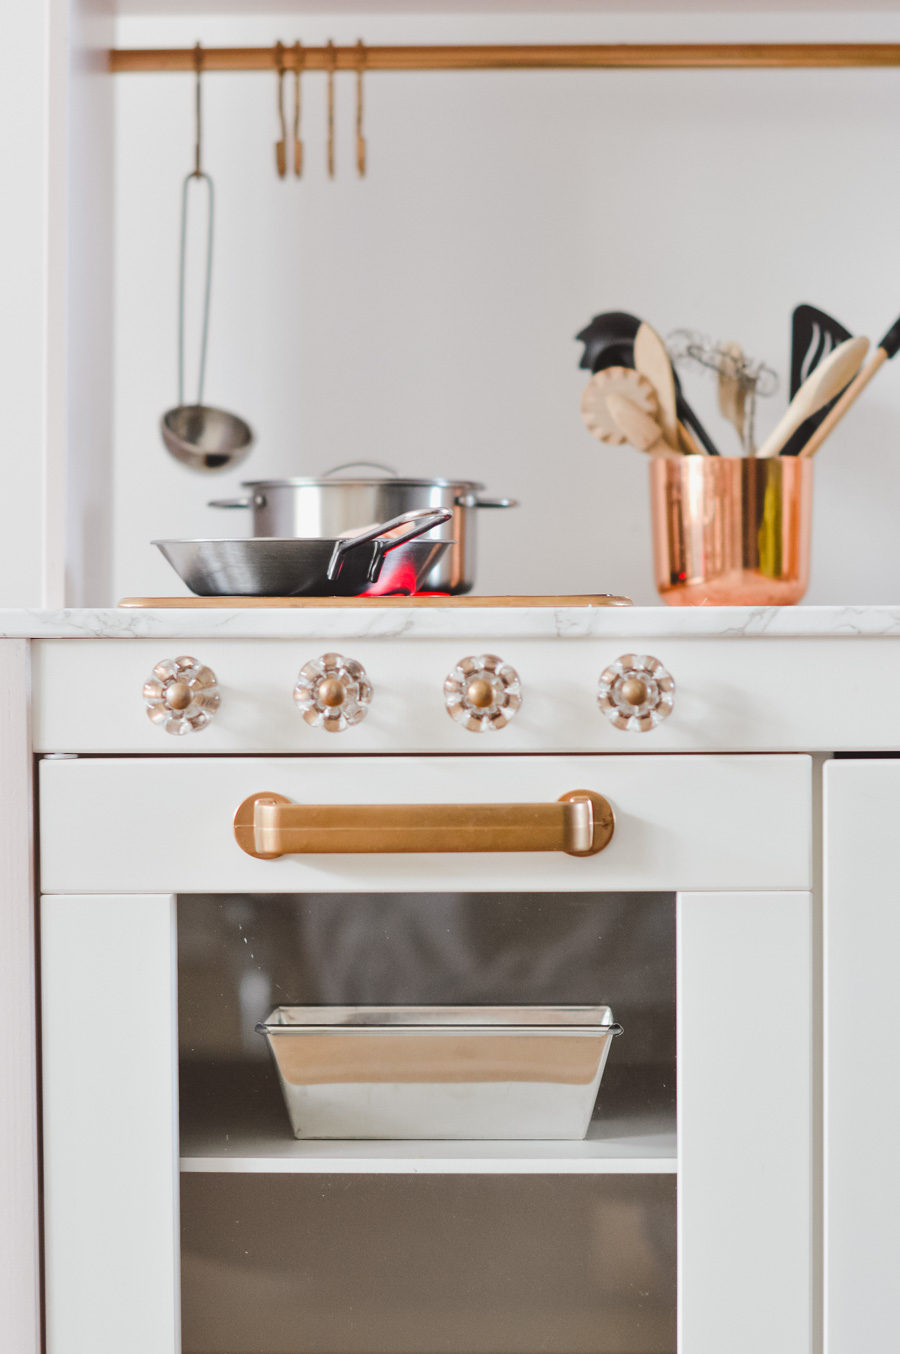 The Ikea children's kitchen: a few ideas on how to pimp it up beautifully # ikeaküche #ikeakitchen #ikeahack # kinderküche #diy